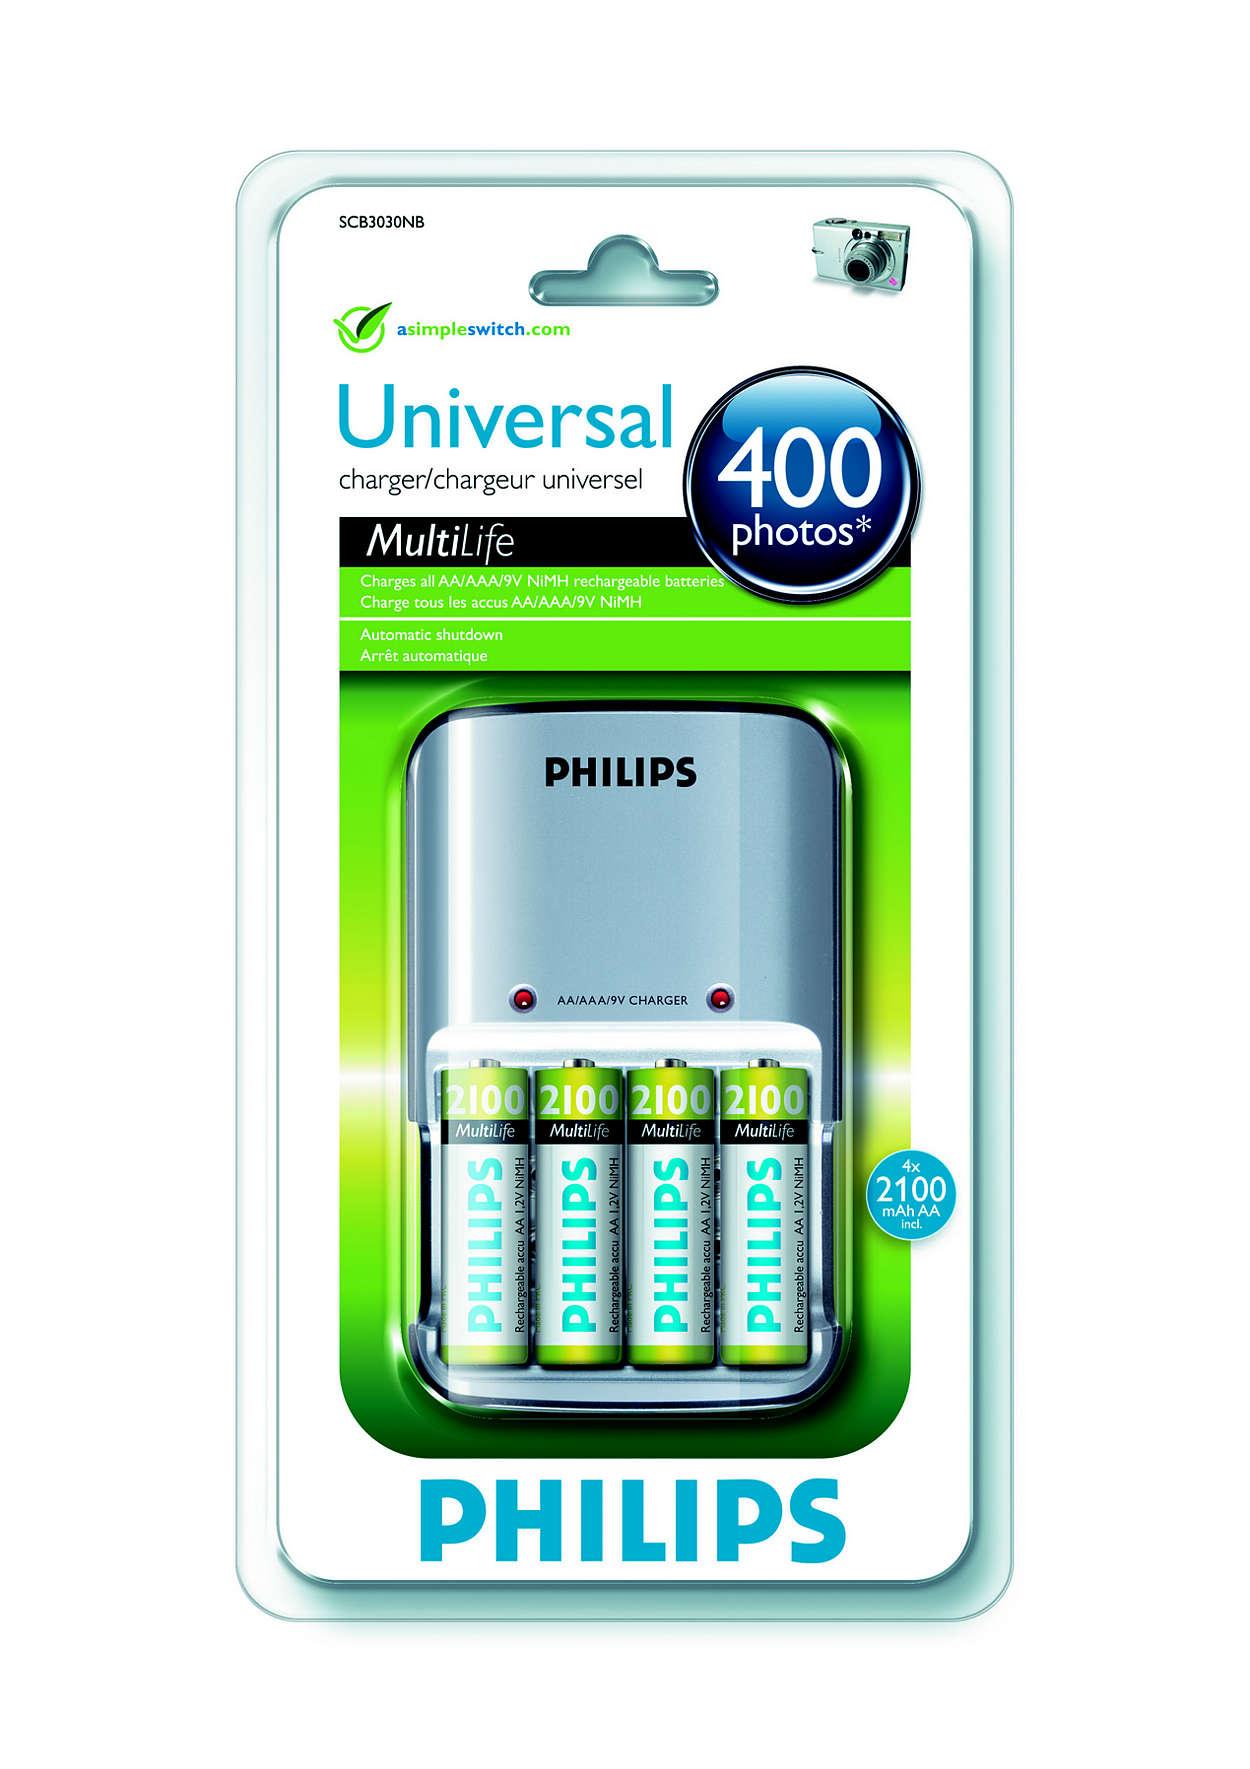 Зарежда всякакви AA/AAA/9V NiMH акумулаторни батерии